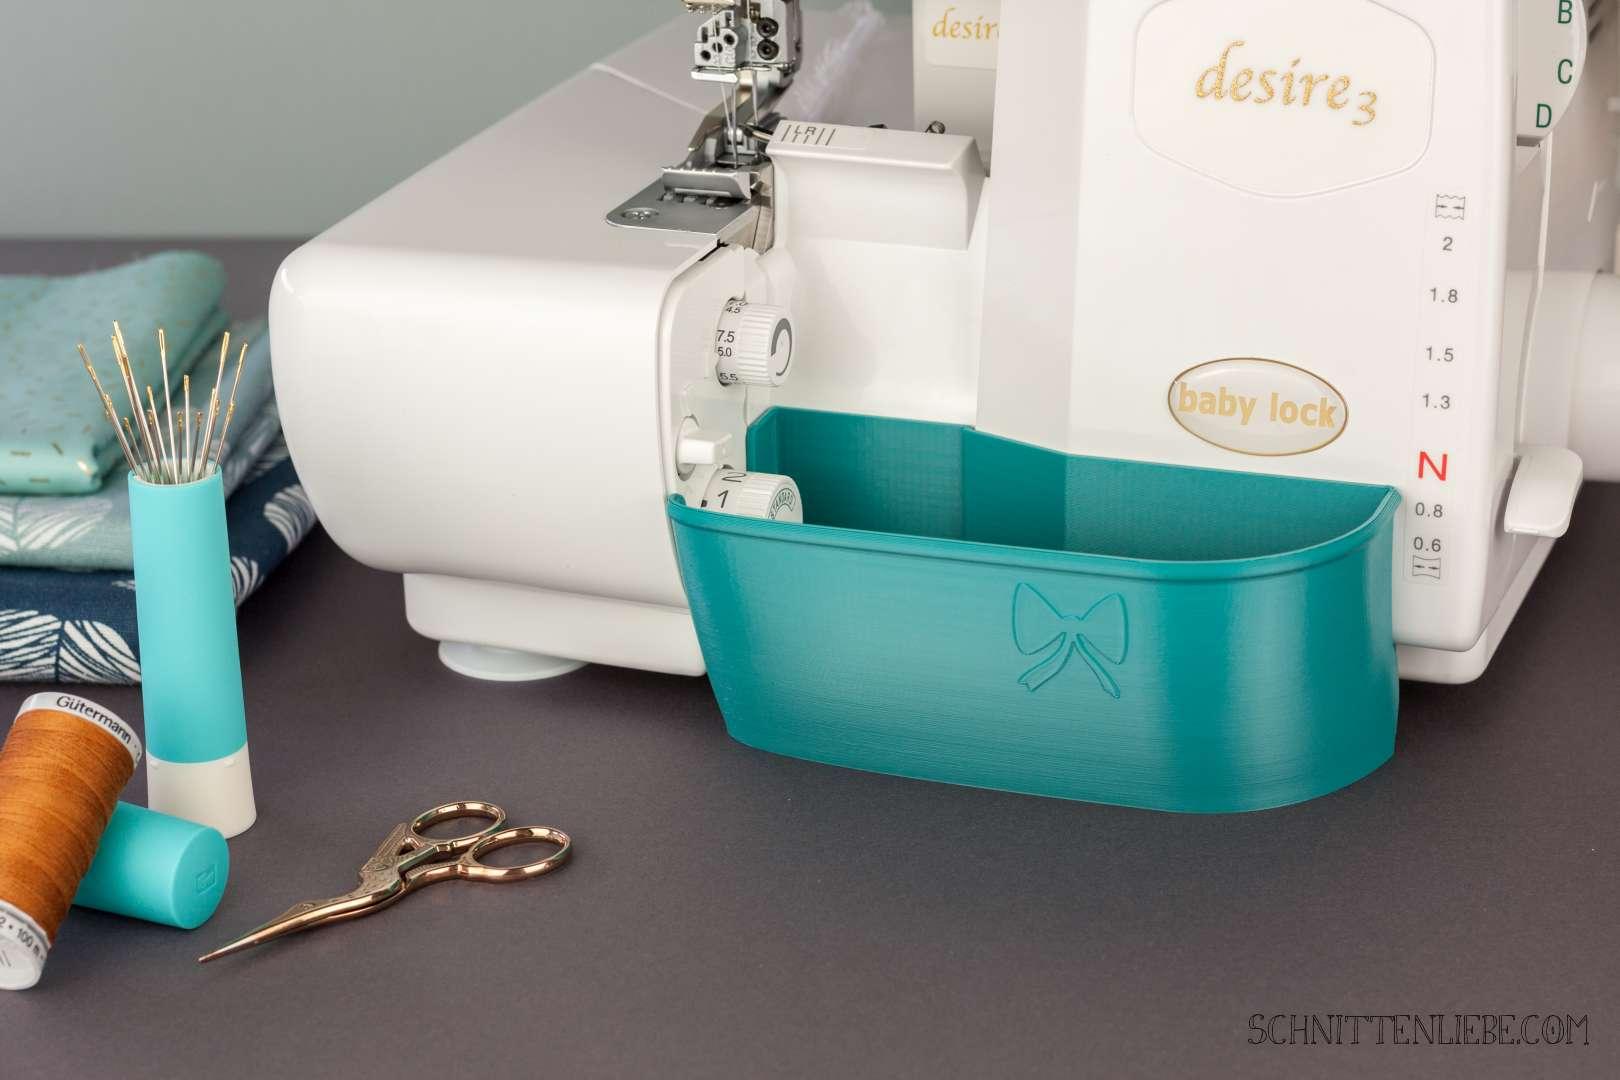 Schnittenliebe 3D Auffangbehälter Babylock Desire 3 Petrol